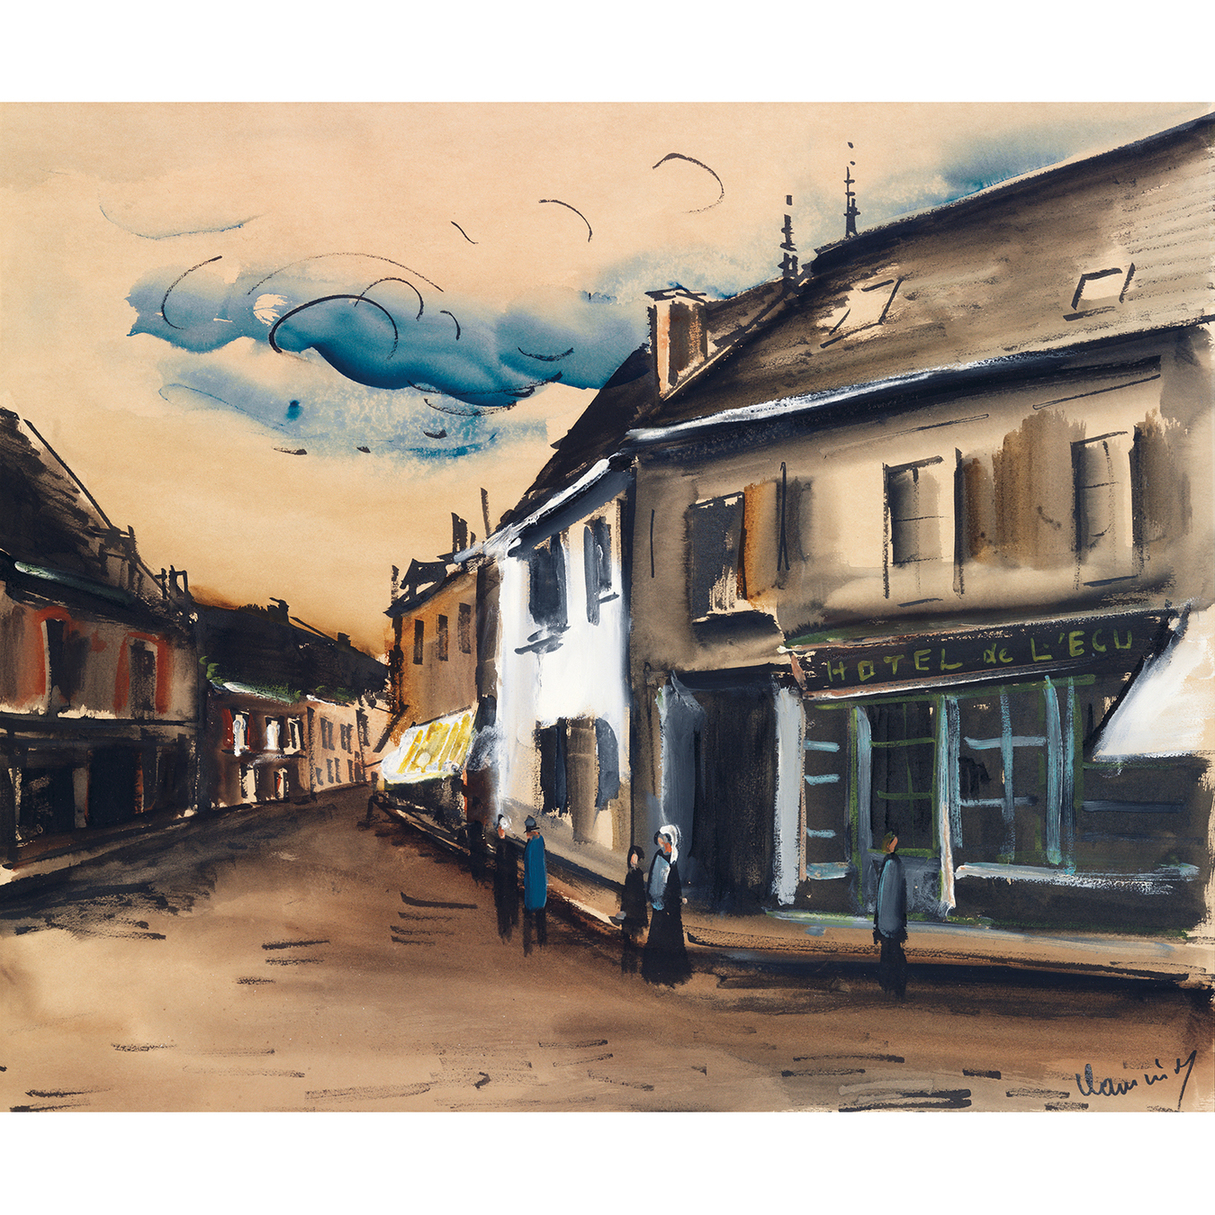 Maurice de Vlaminck-Hotel De L'Ecu A Brezolles-